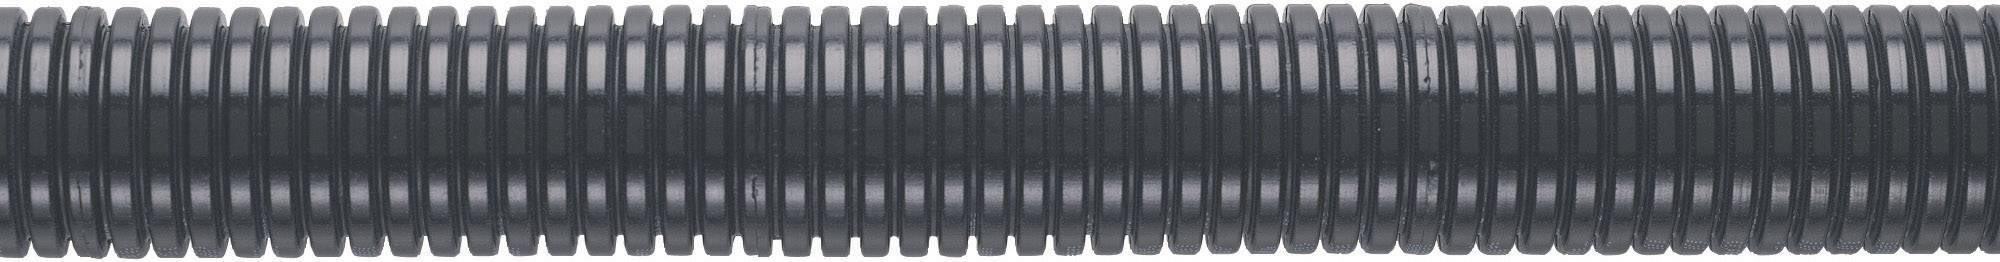 Ochranný plášť (5 m) LappKabel SILVYN FPAS 10/6,3x10 BK (61754005), PA 6